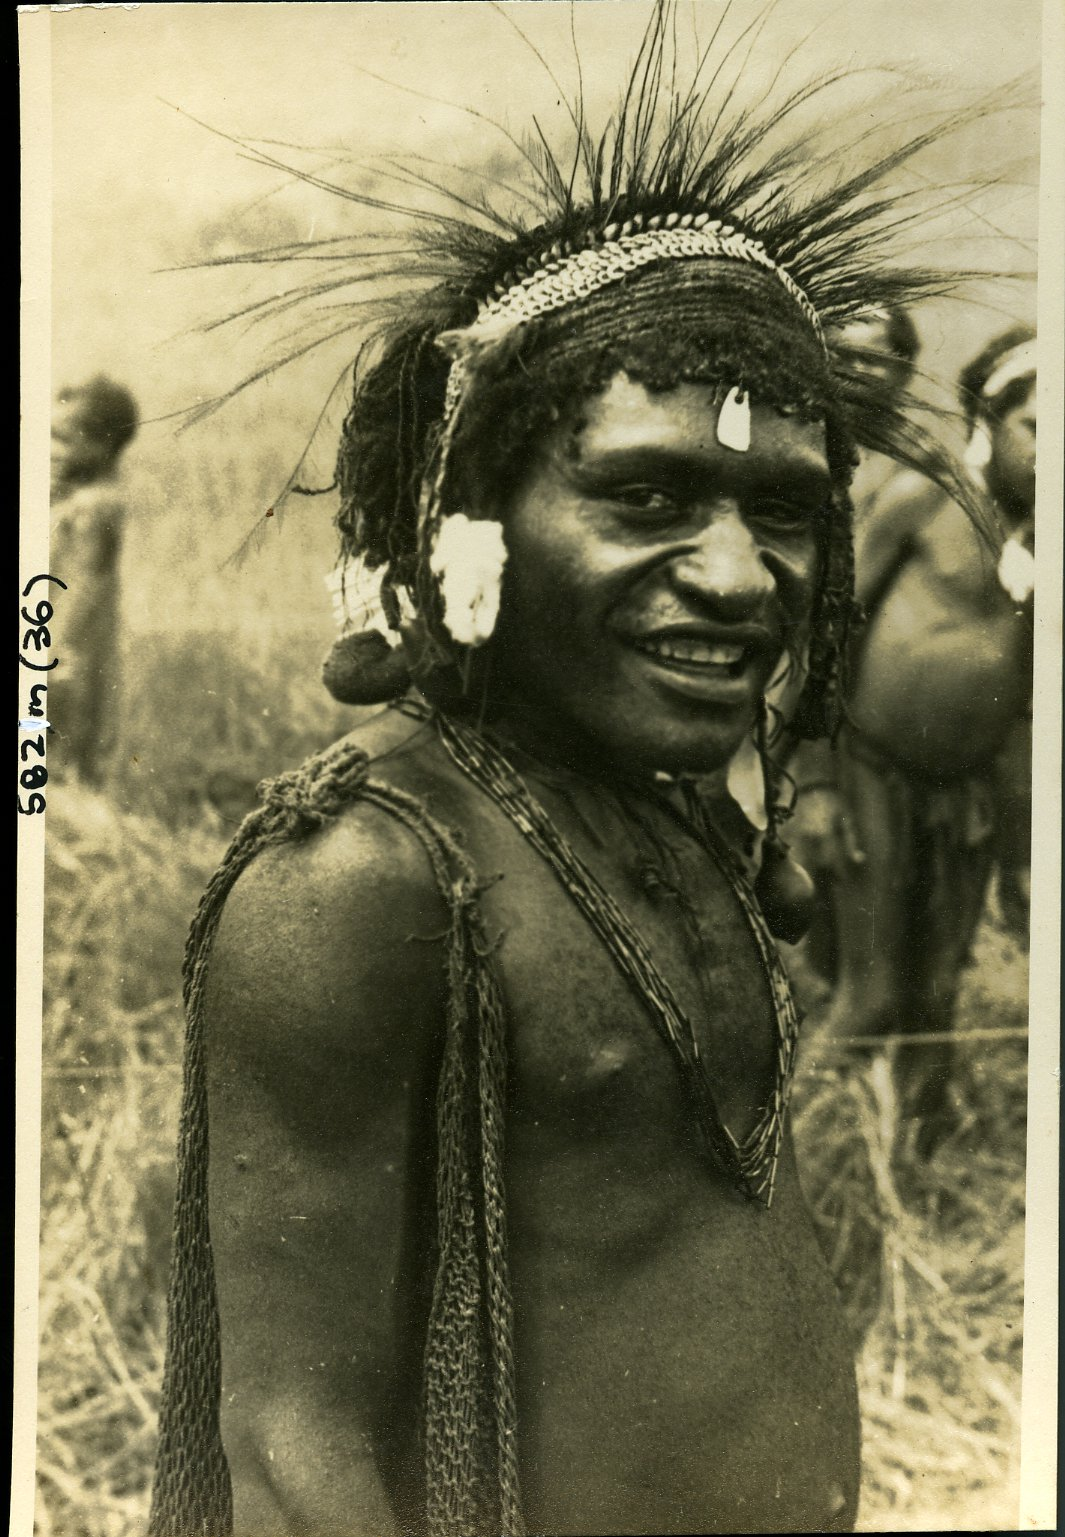 Charles Marshall Papua New Guinea Photographs The Australian Museum